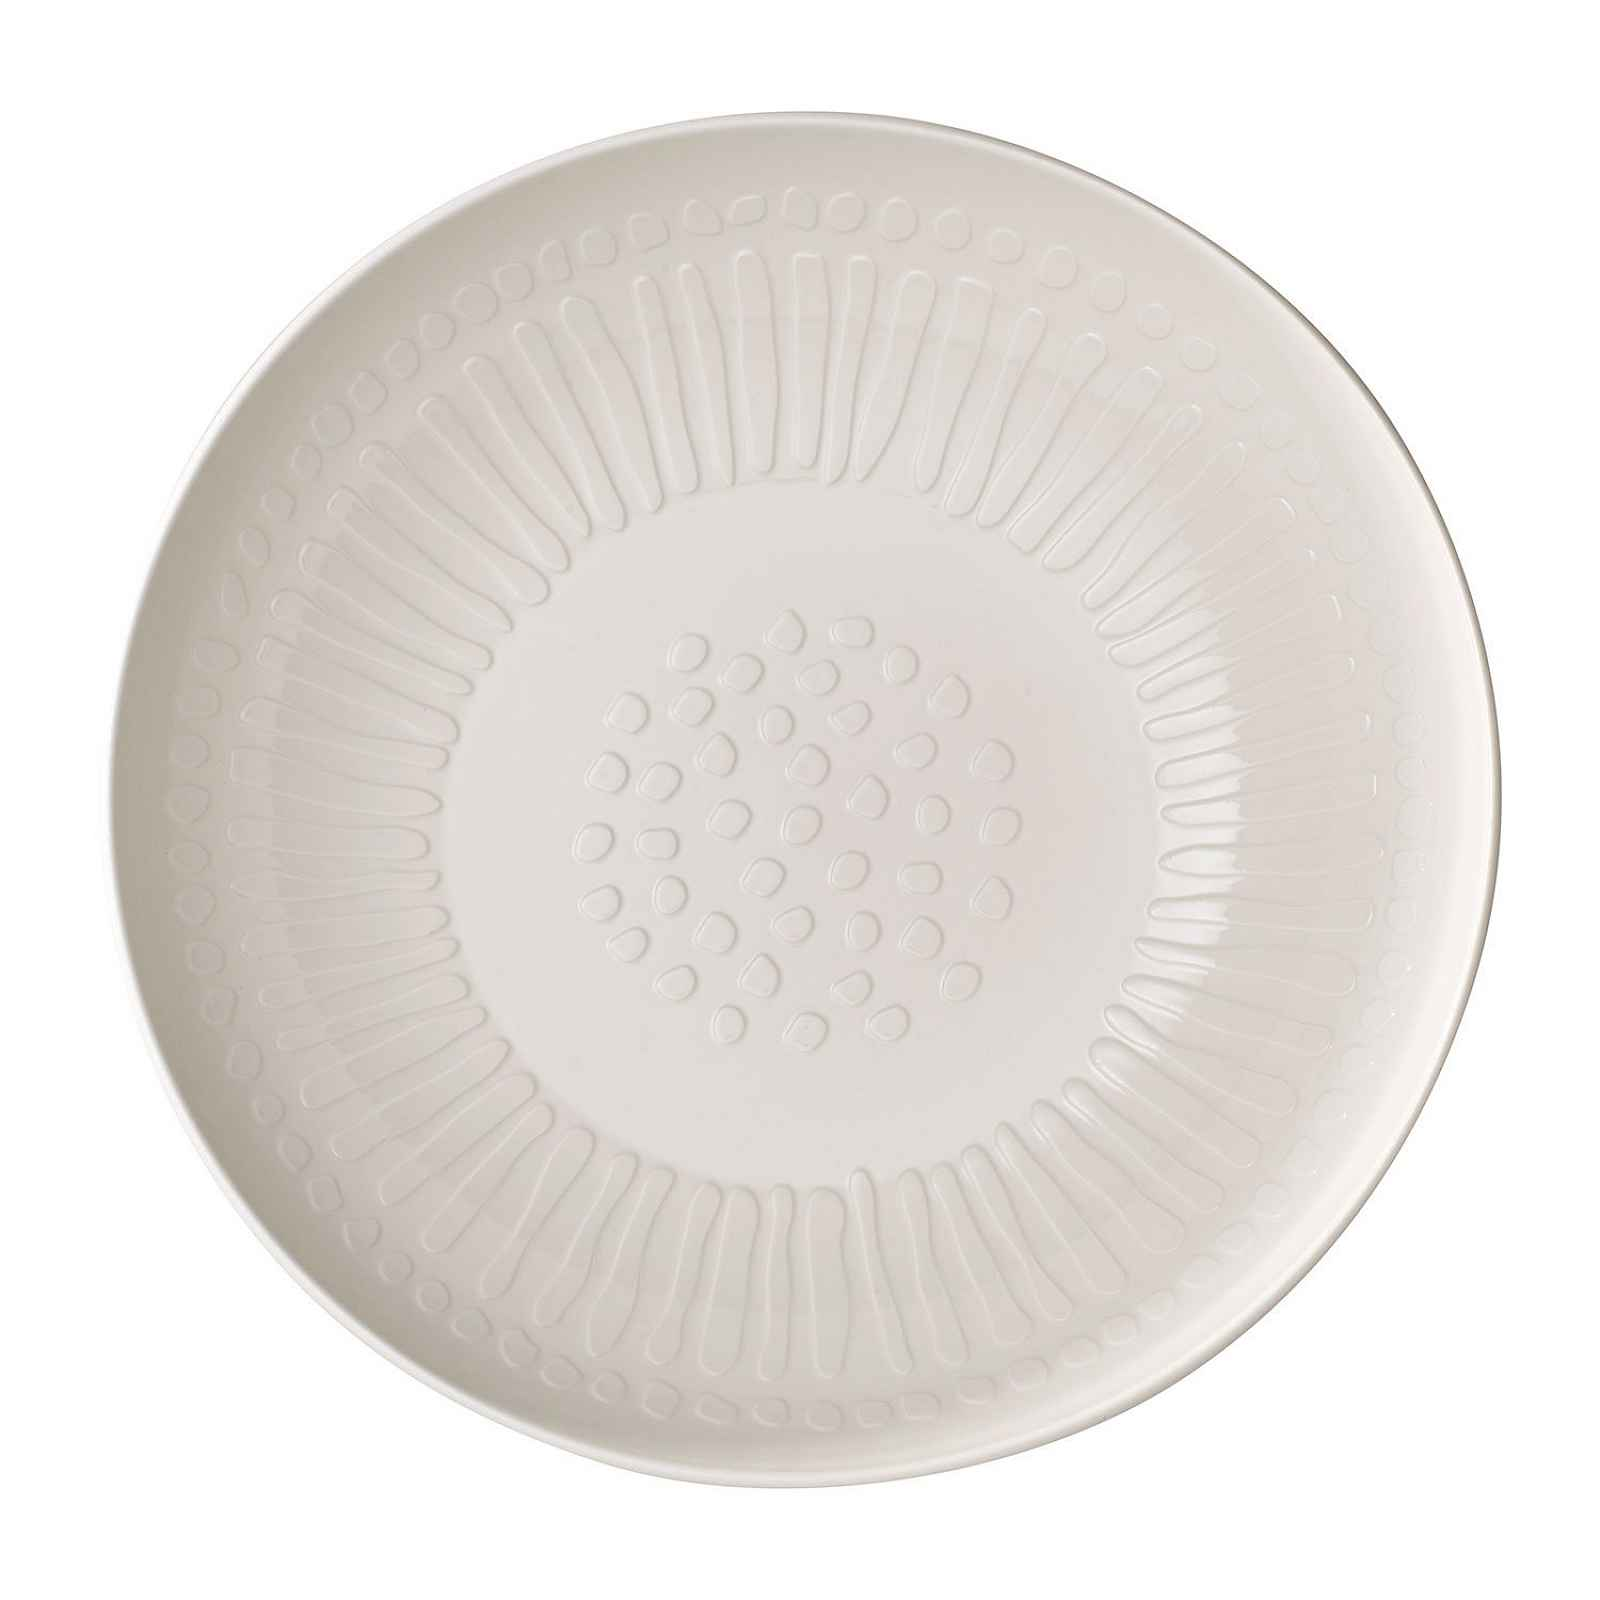 Servírovací bílá porcelánová miska Villeroy & Boch Blossom, ⌀ 26 cm